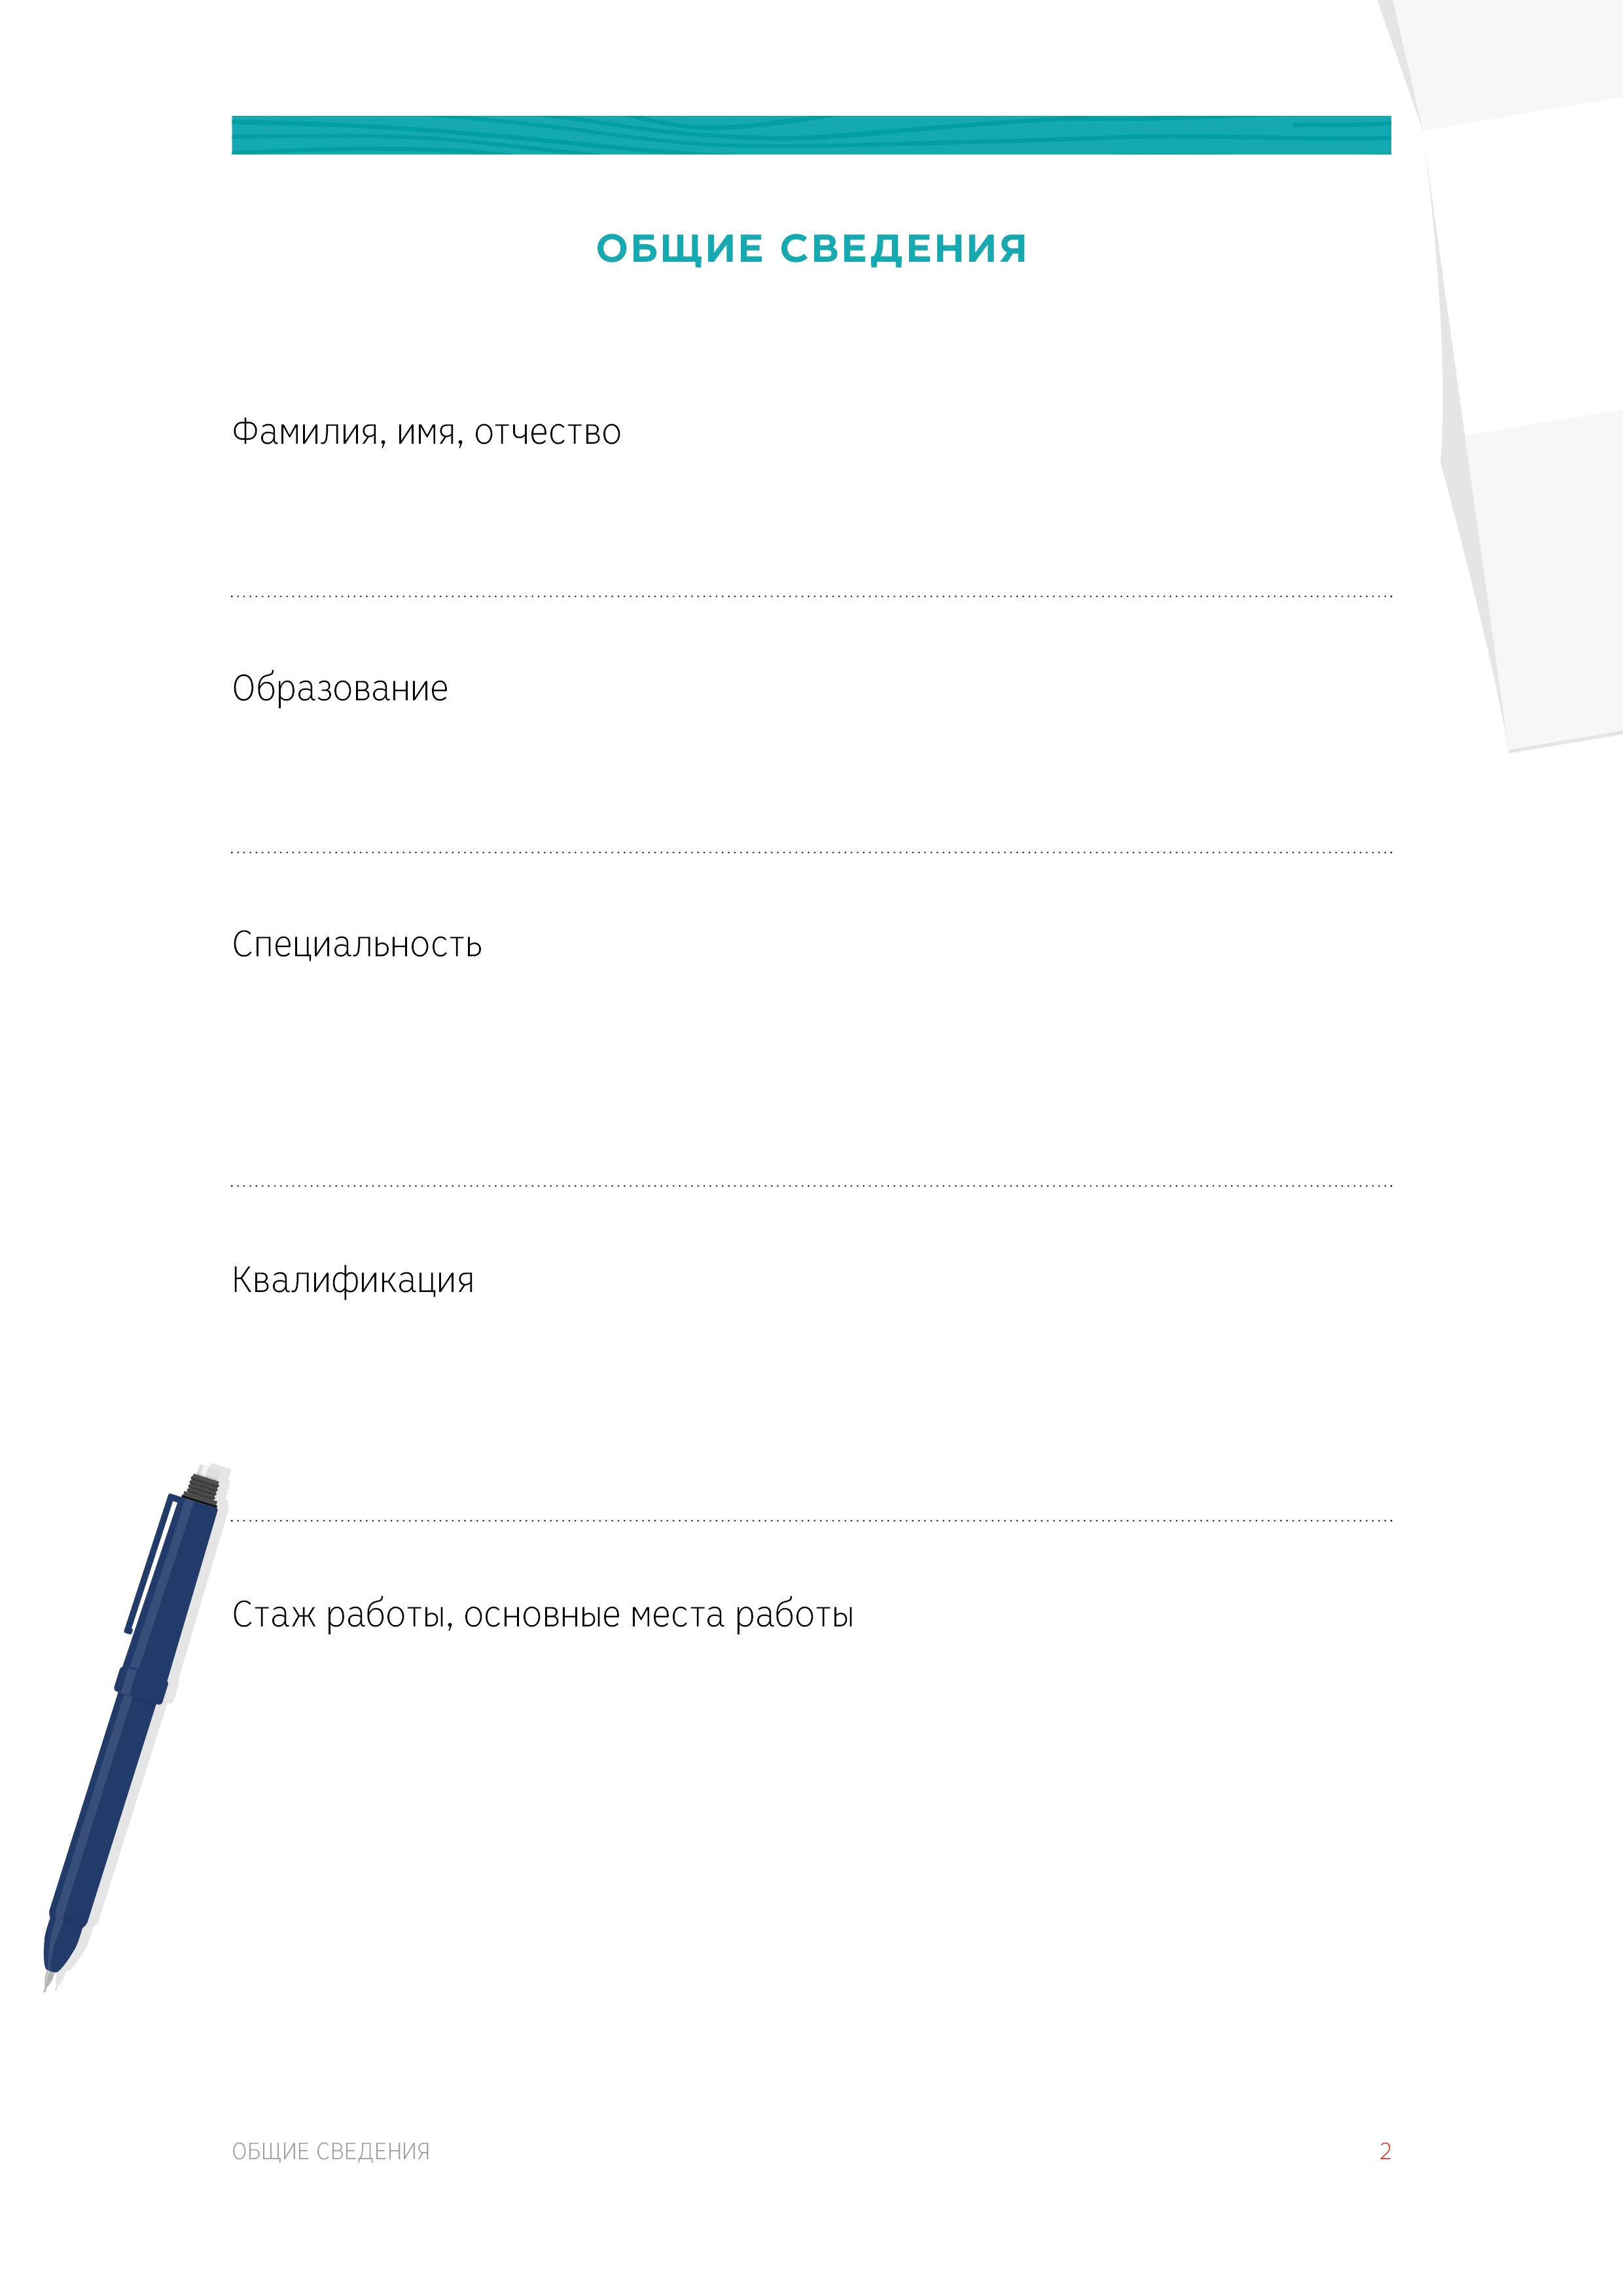 D:\projects\Александр\Олимпиады\Май2015\Портфель учителя\!send\my_portfolio1_3.png